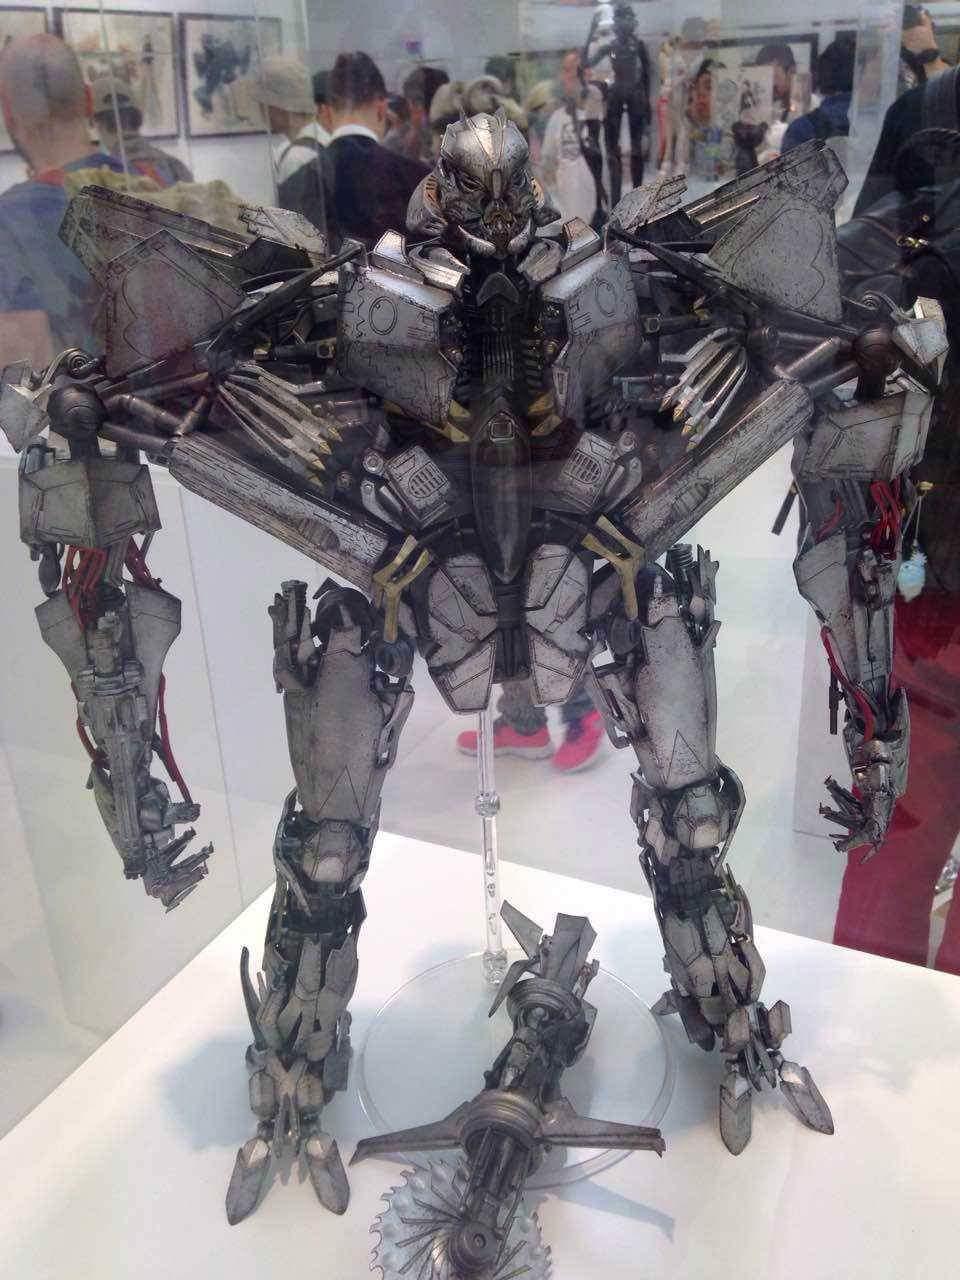 Figurines des Films Transformers ― Par Threezero (3A ThreeA), Comicave Studios, etc 3A-Starscream-02